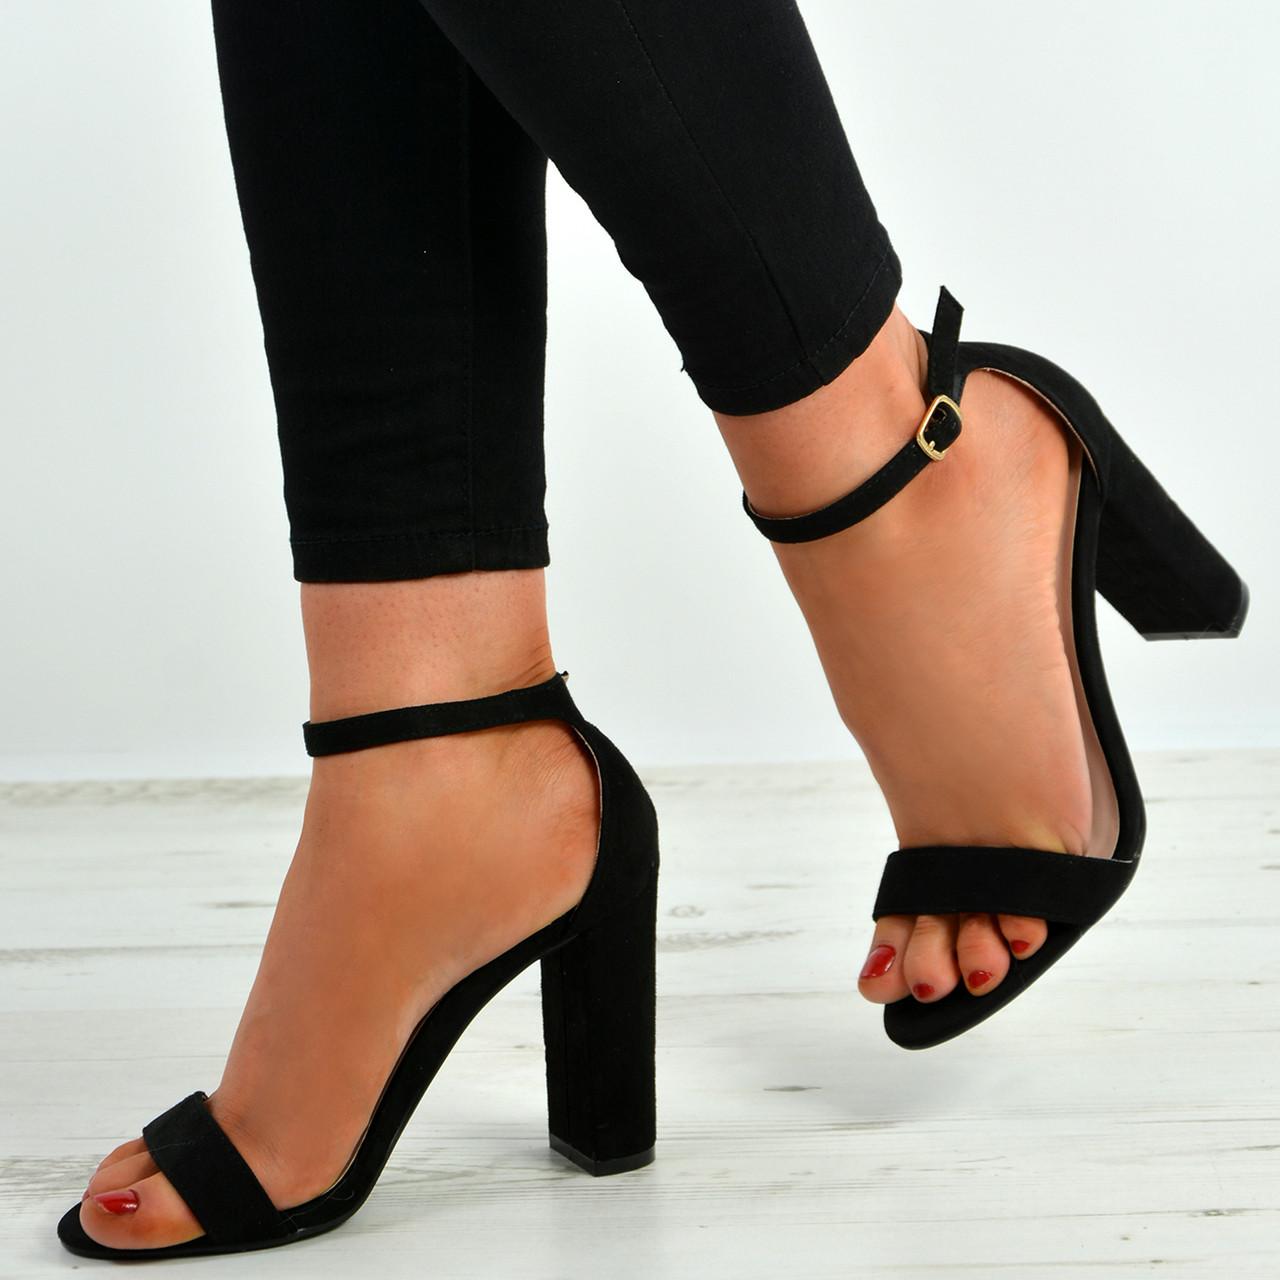 Black Block Heel Ankle Strap Shoes